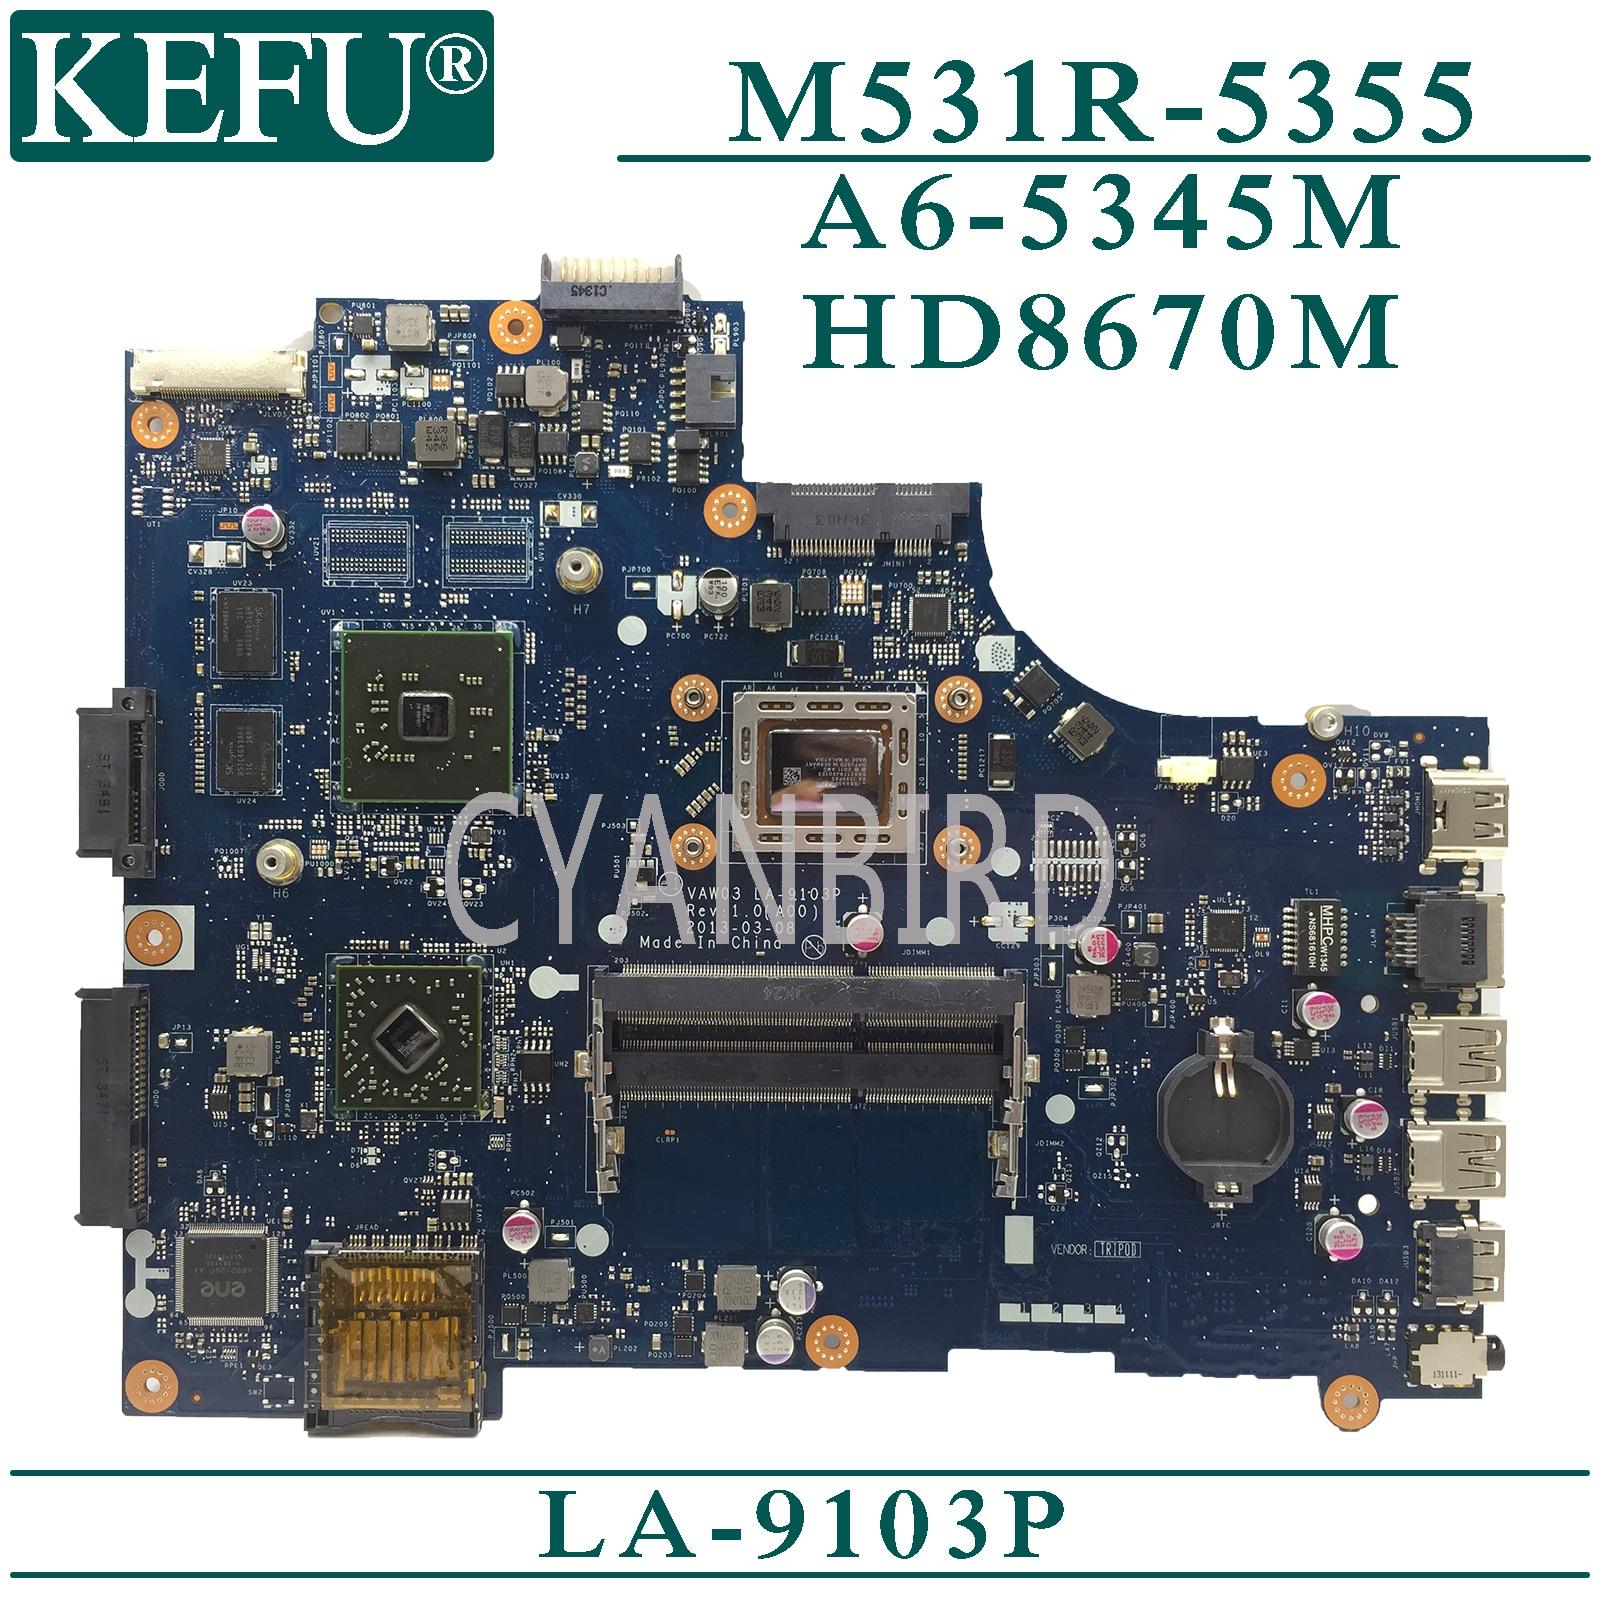 KEFU LA-9103P اللوحة الرئيسية الأصلية لديل انسبايرون M531R 5355 مع A6-5345M HD8670M اللوحة الأم للكمبيوتر المحمول